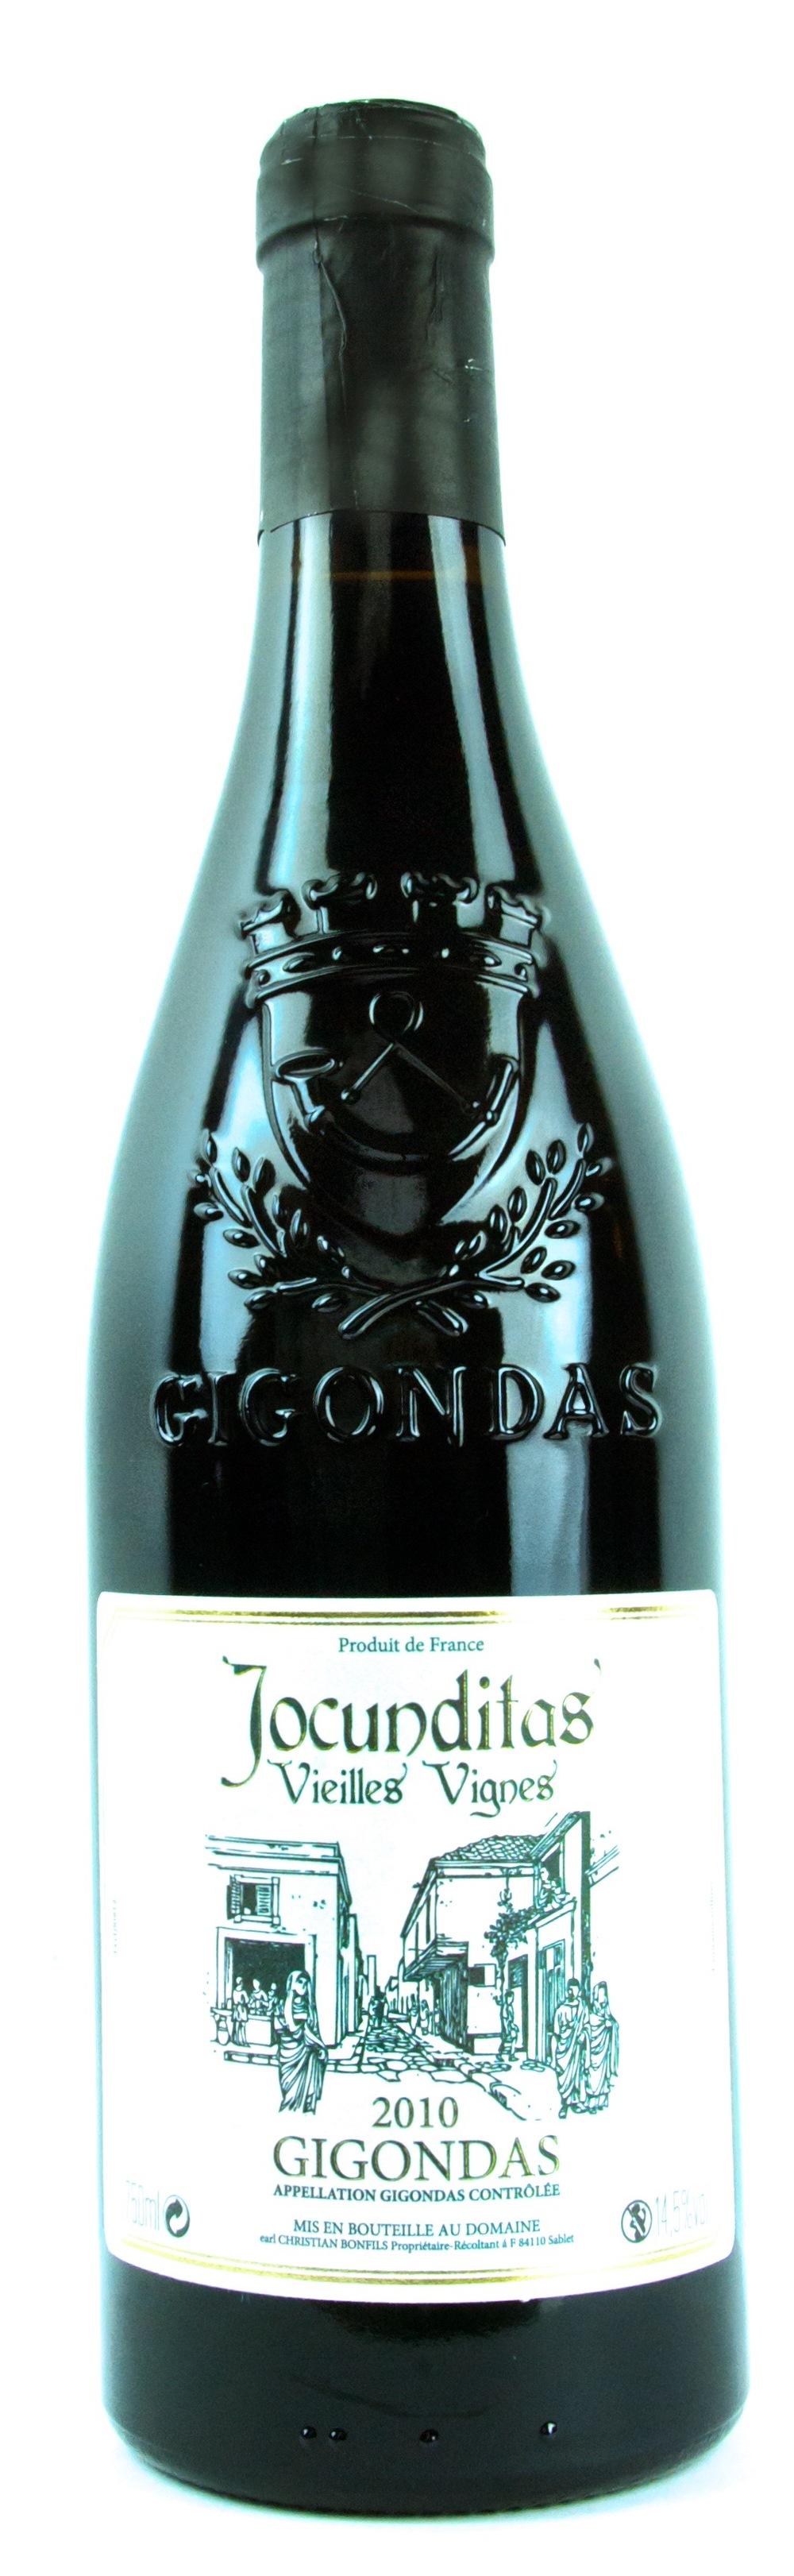 Jocunditas Gigondas